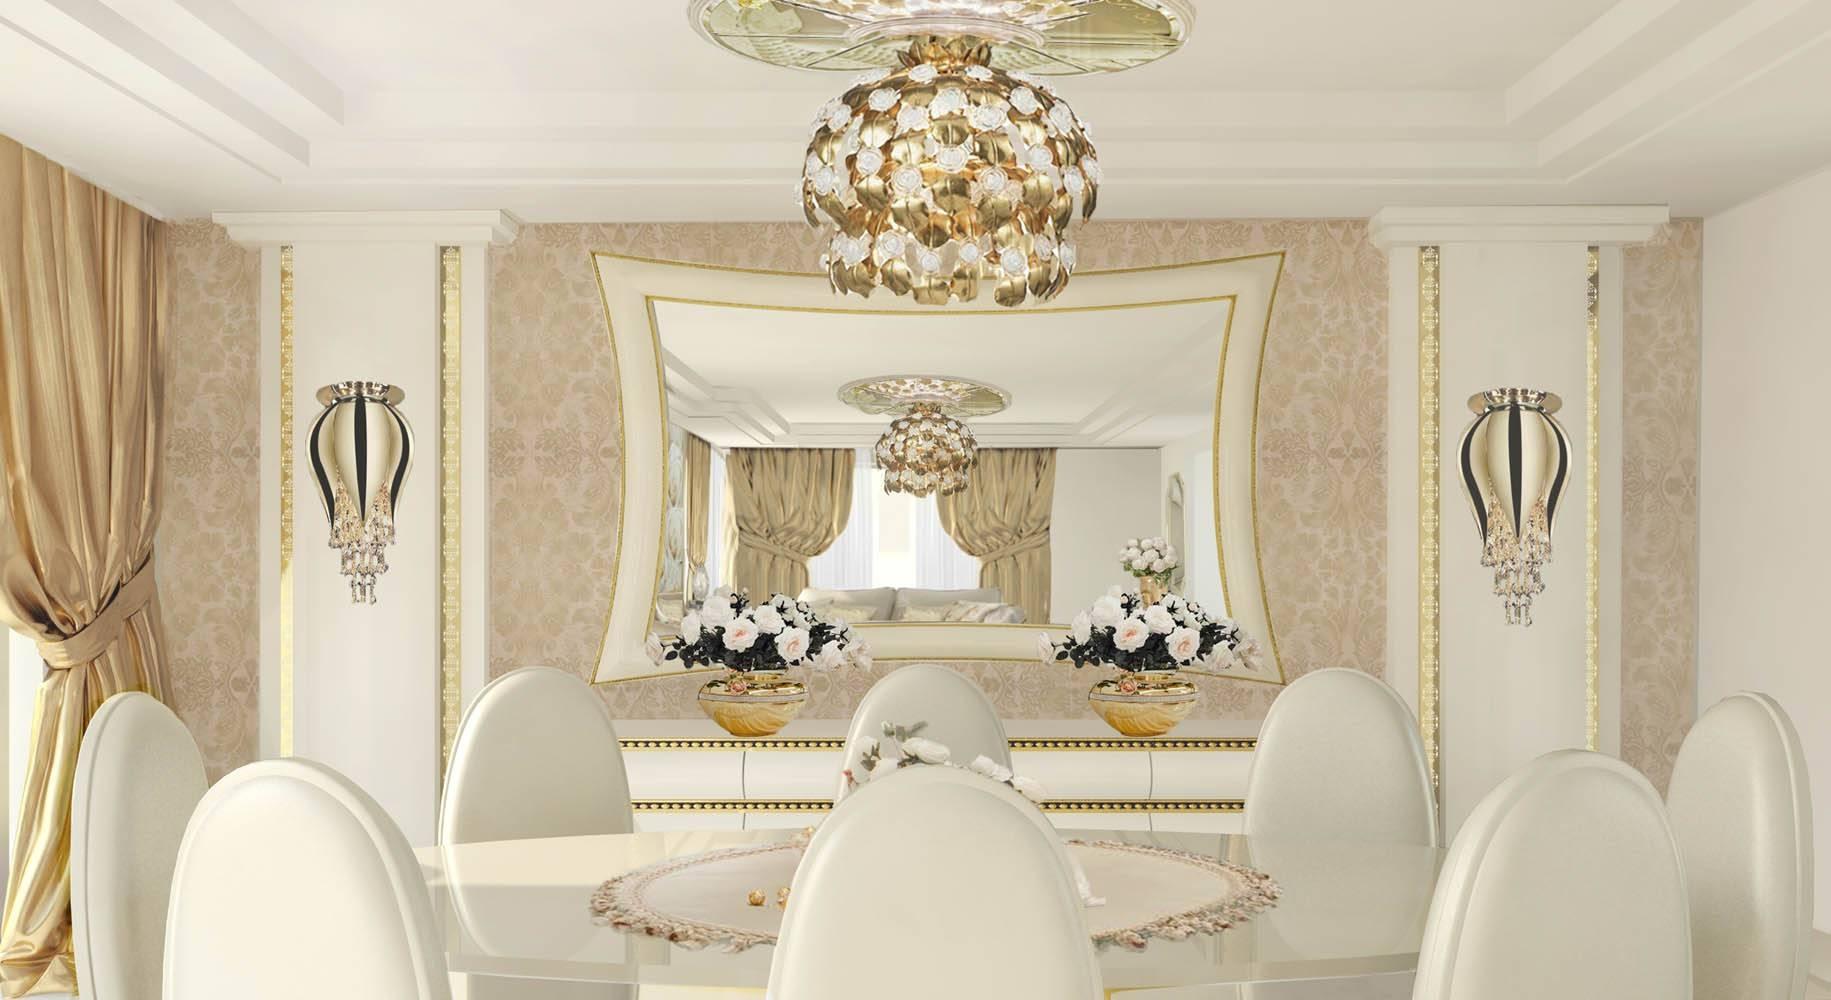 Luxury Interior Design Lidia Bersani - Interior with Swarovski Mirrors (Image 20 of 25)